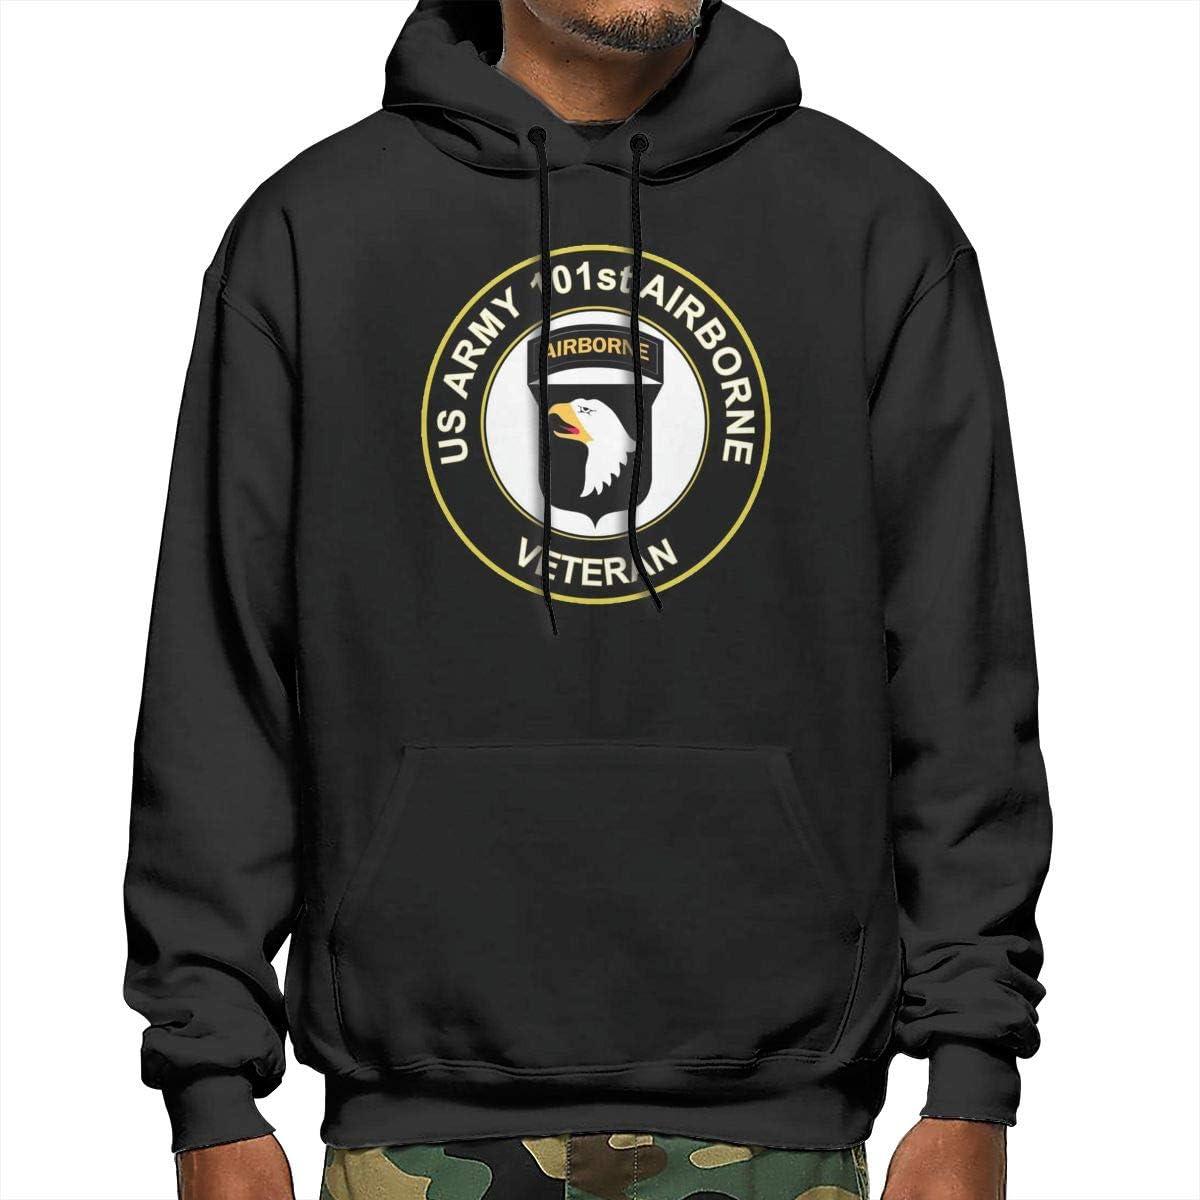 Sanda U.S Army Veteran 101st Airborne Division Mens Hooded Sweatshirt